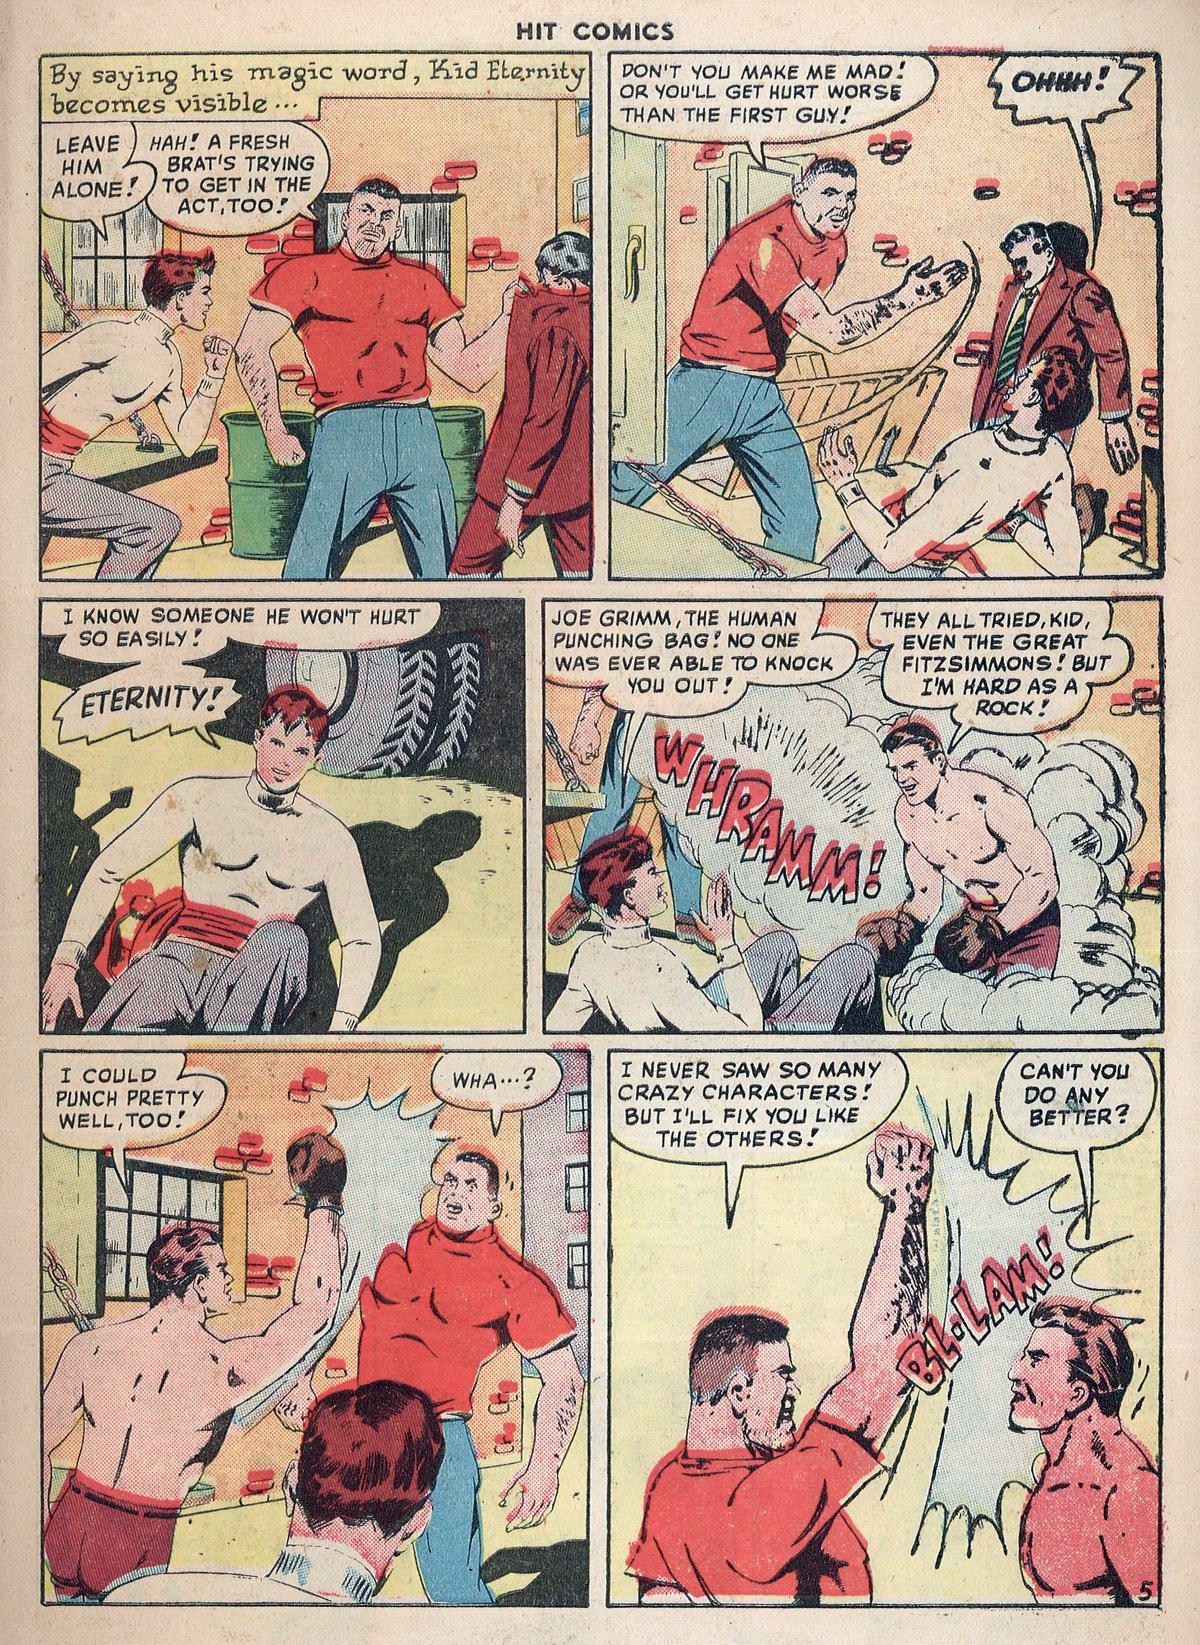 Read online Hit Comics comic -  Issue #55 - 7